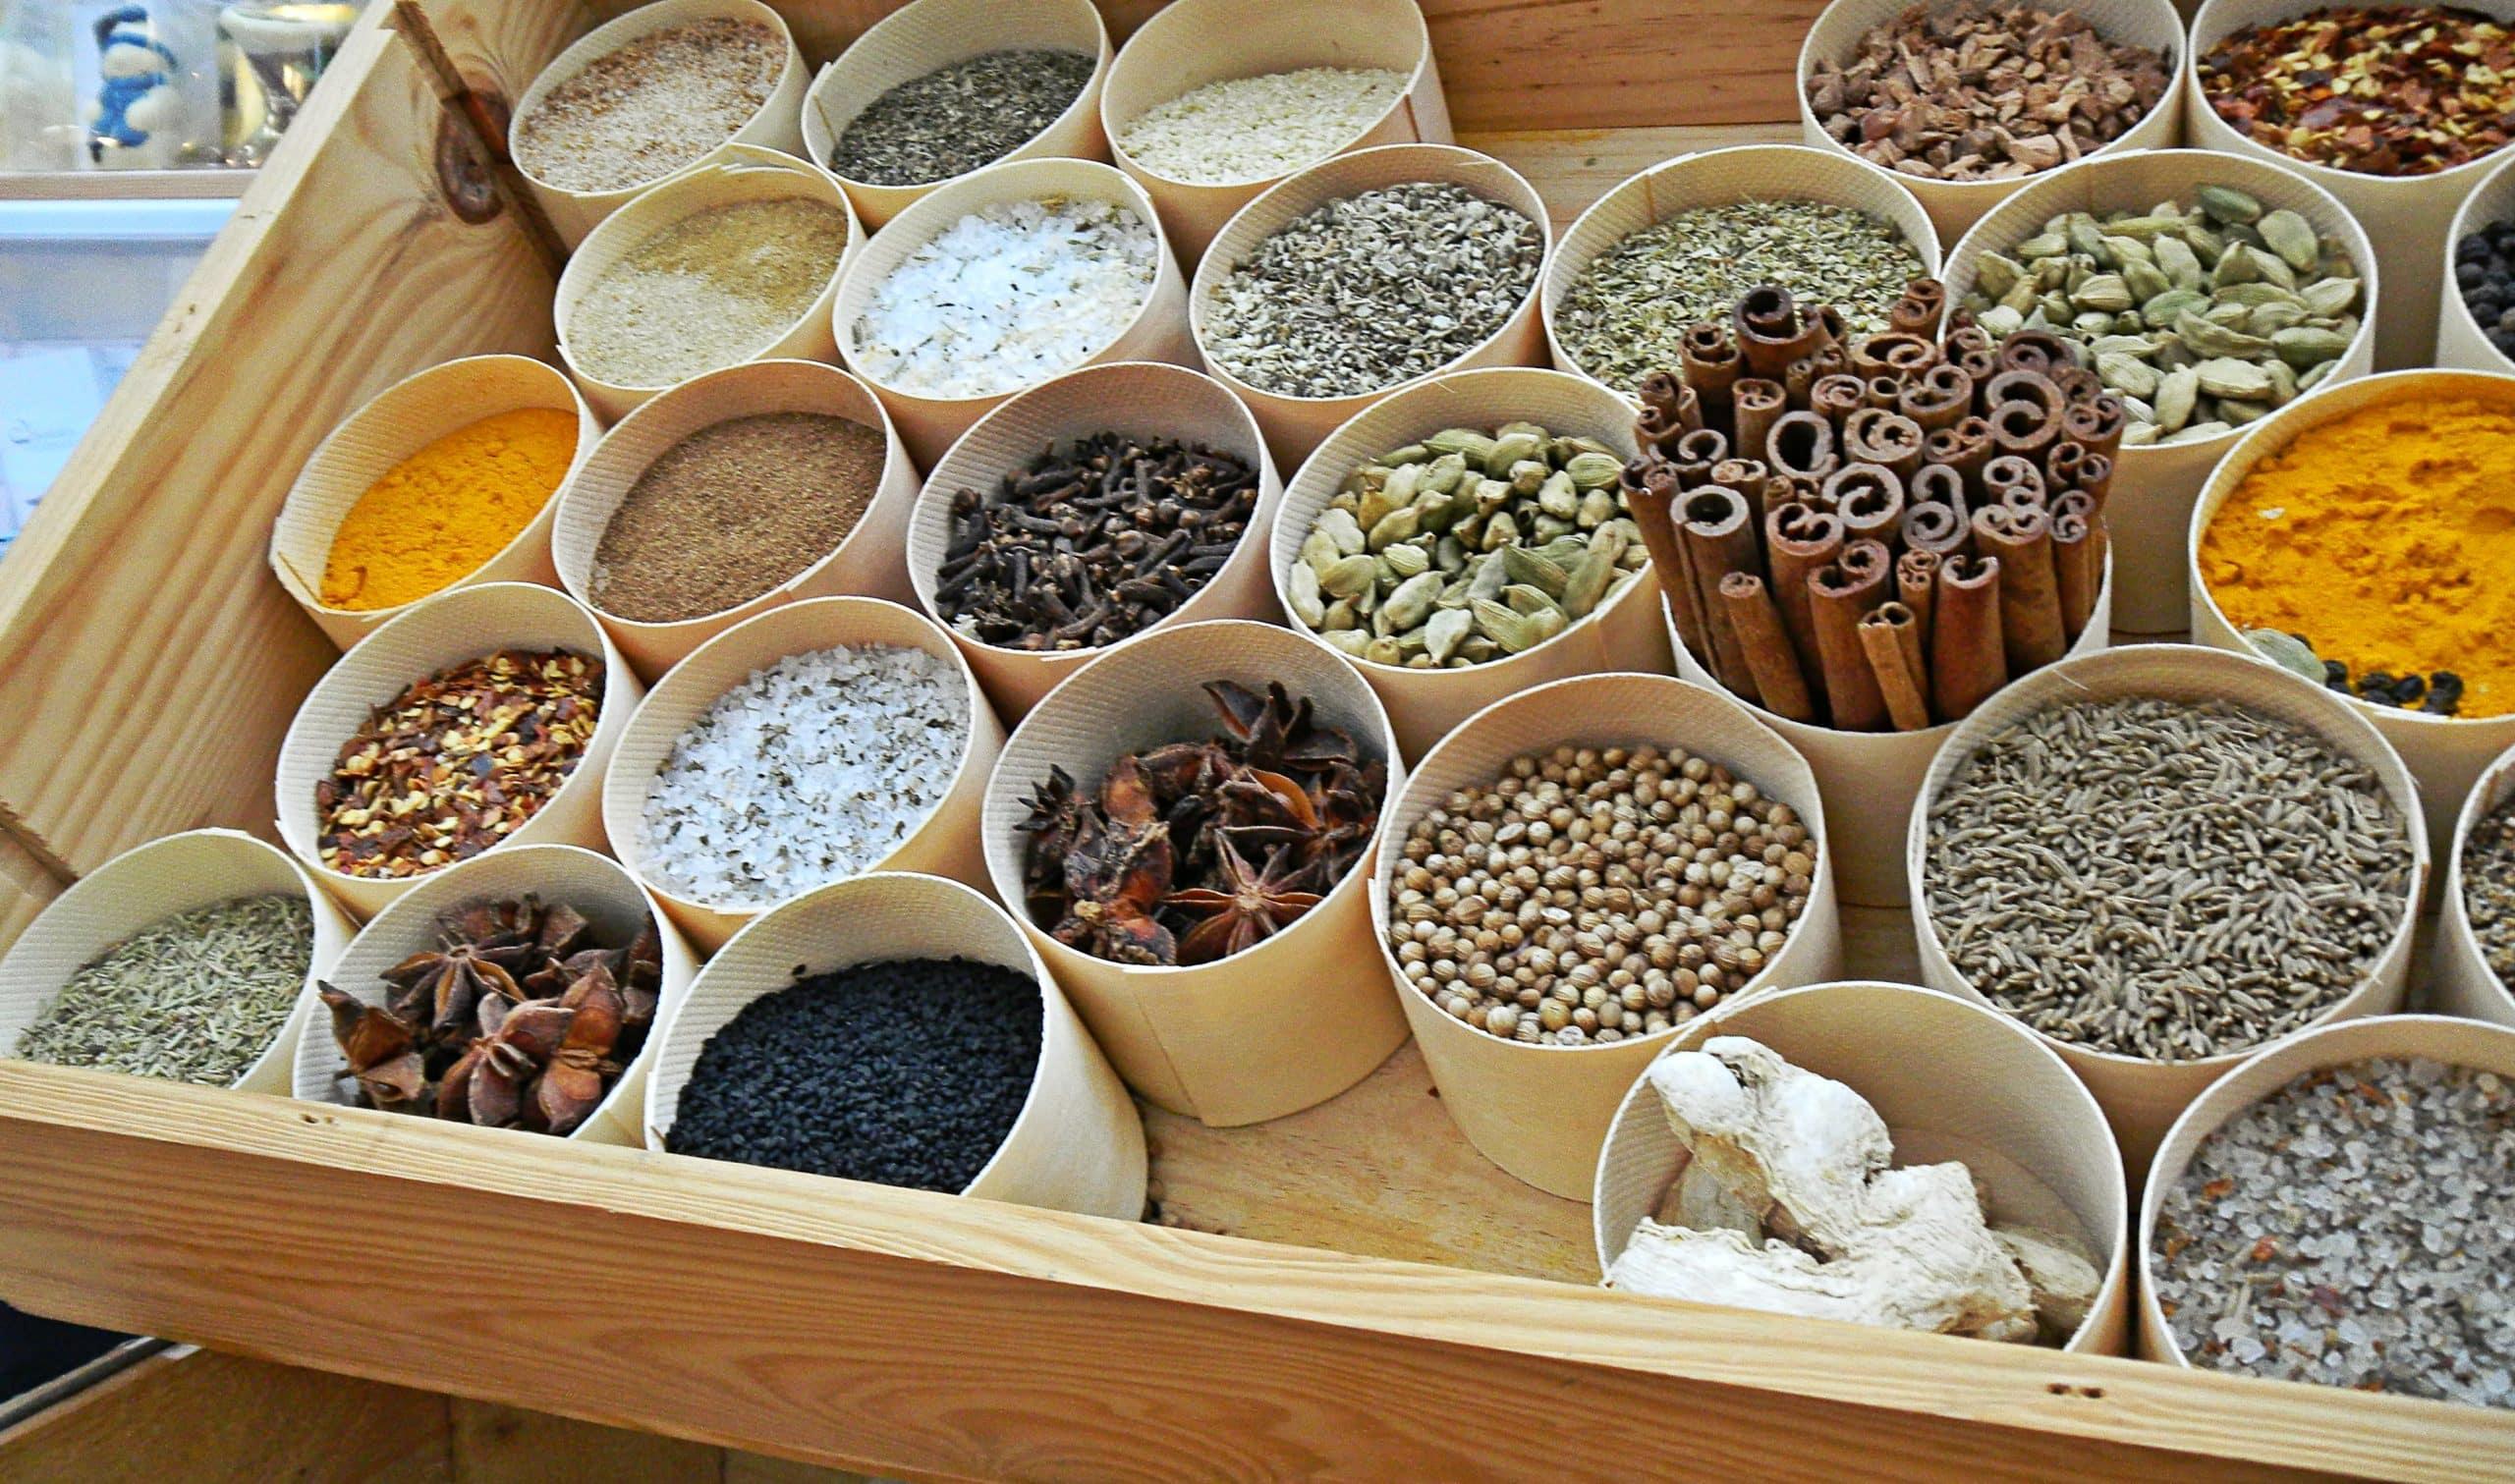 Waddesdon Manor food market spices